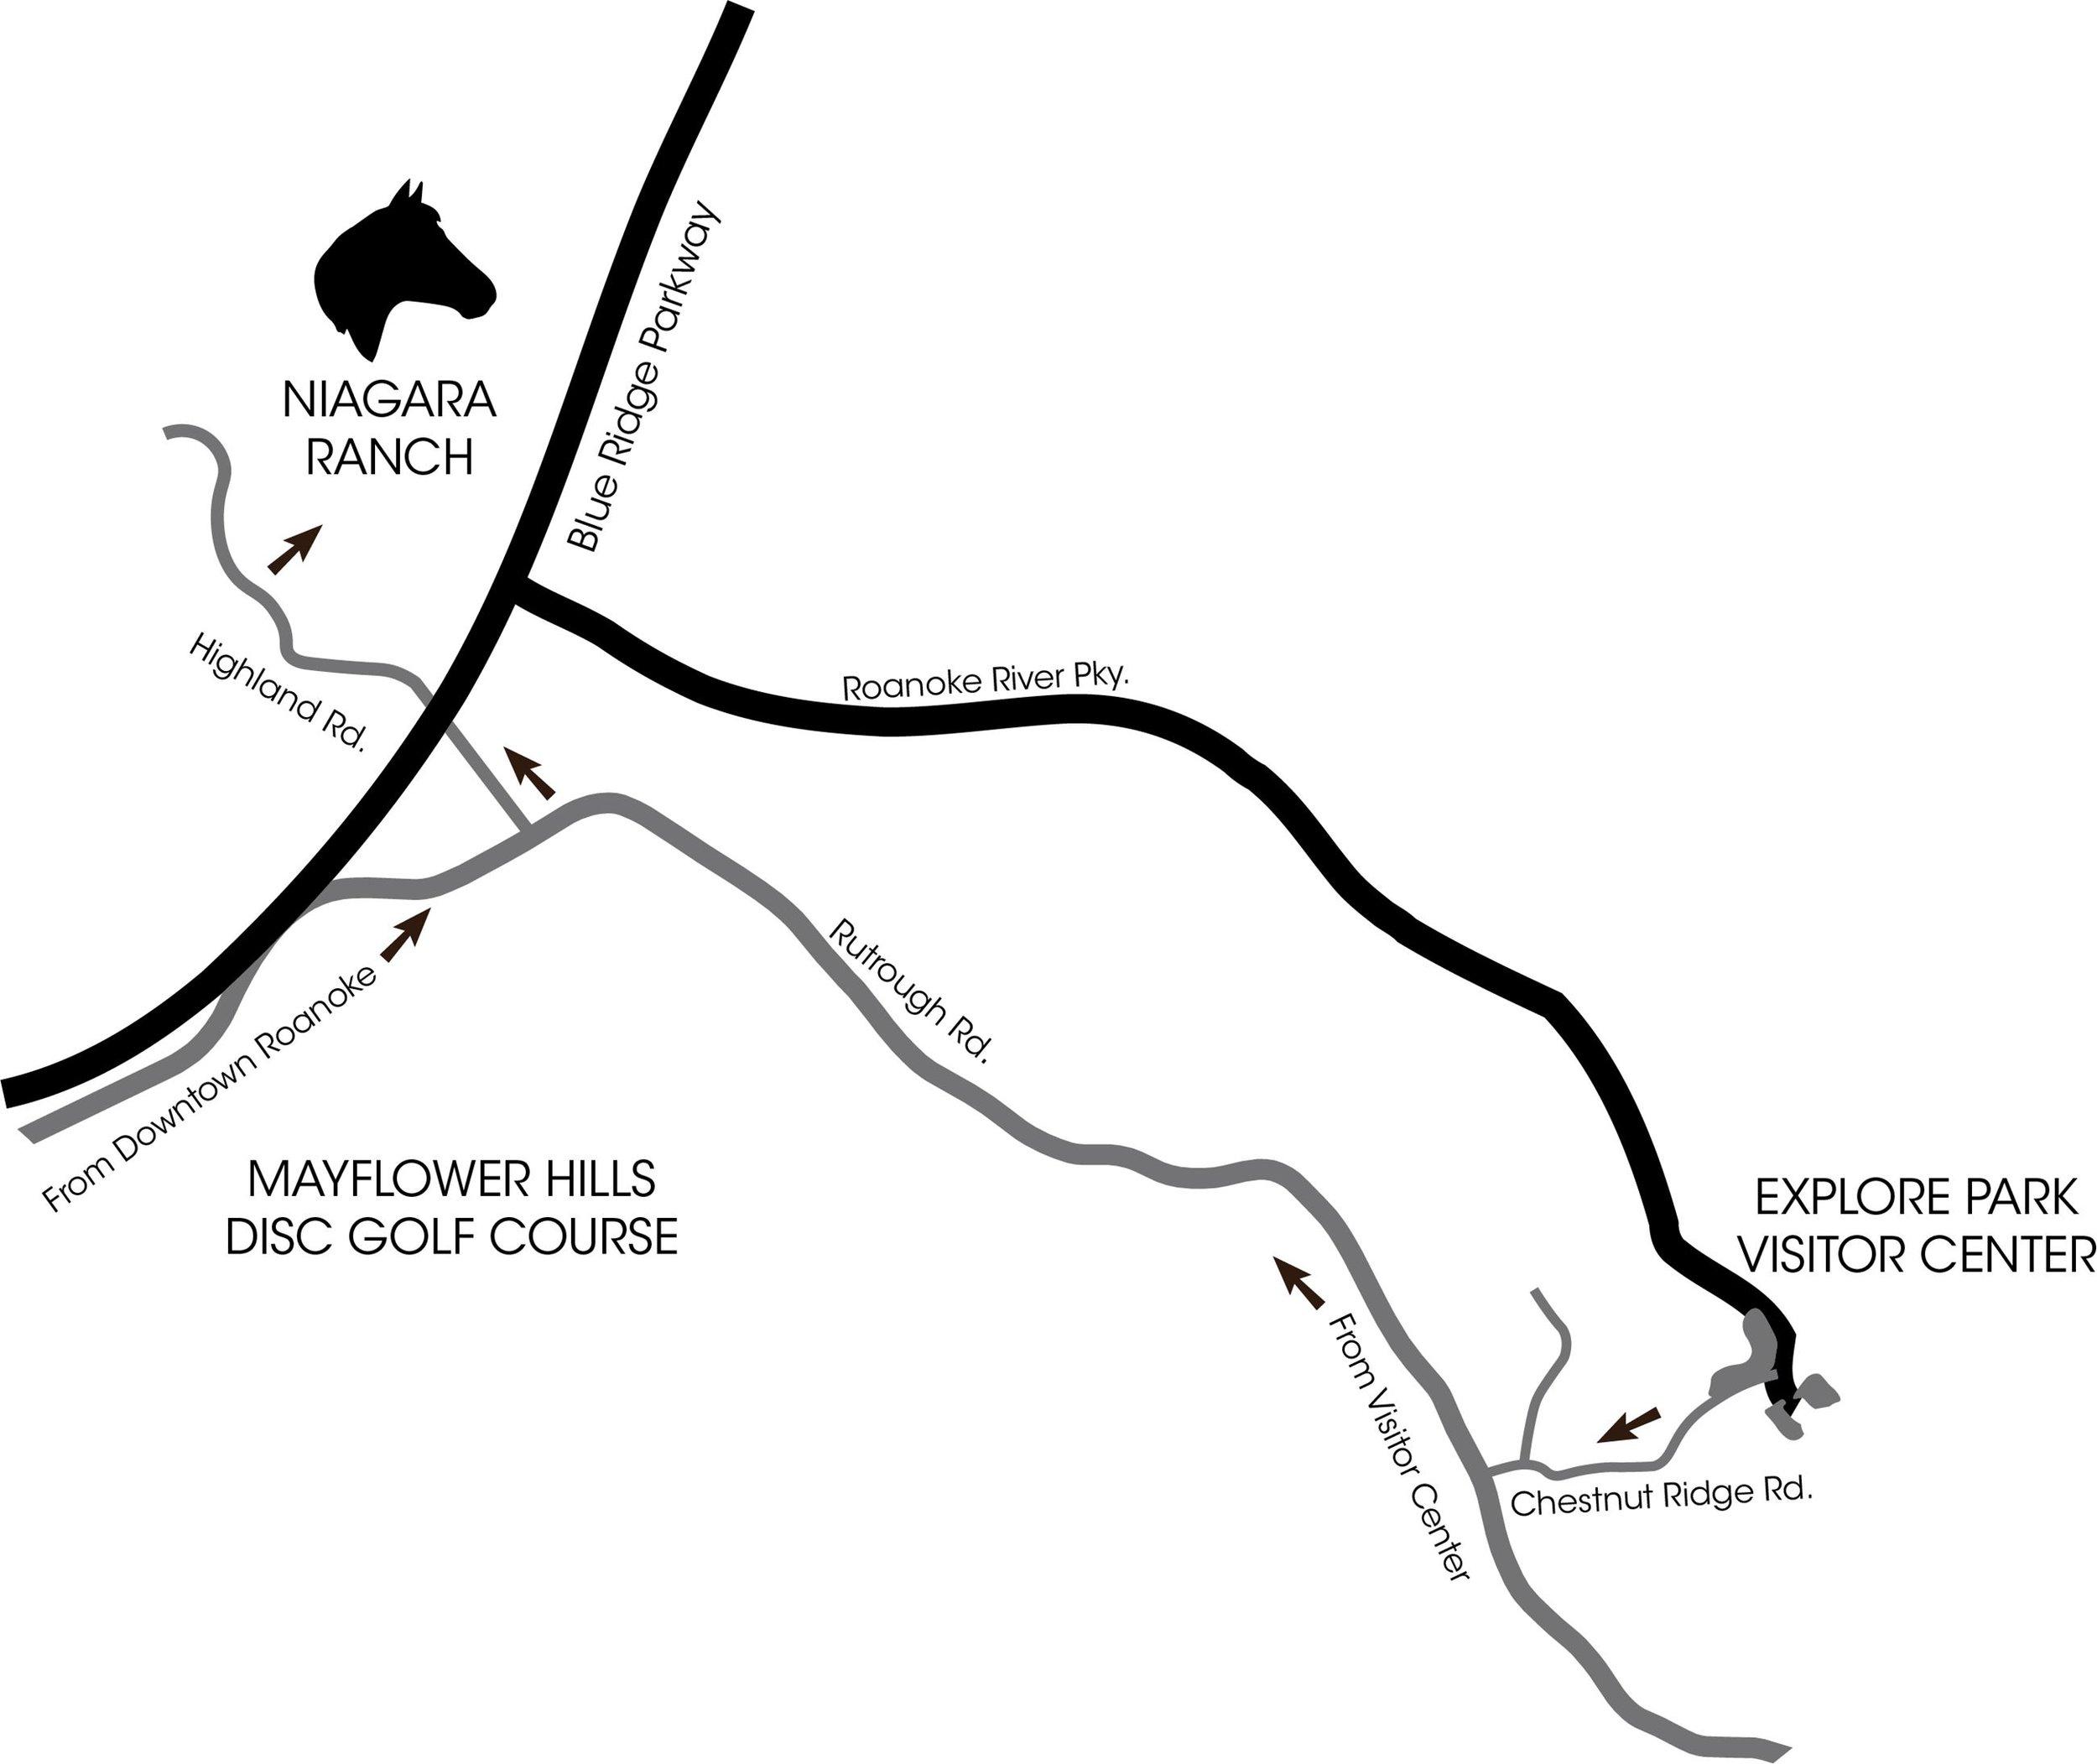 Niagra Ranch map.jpg